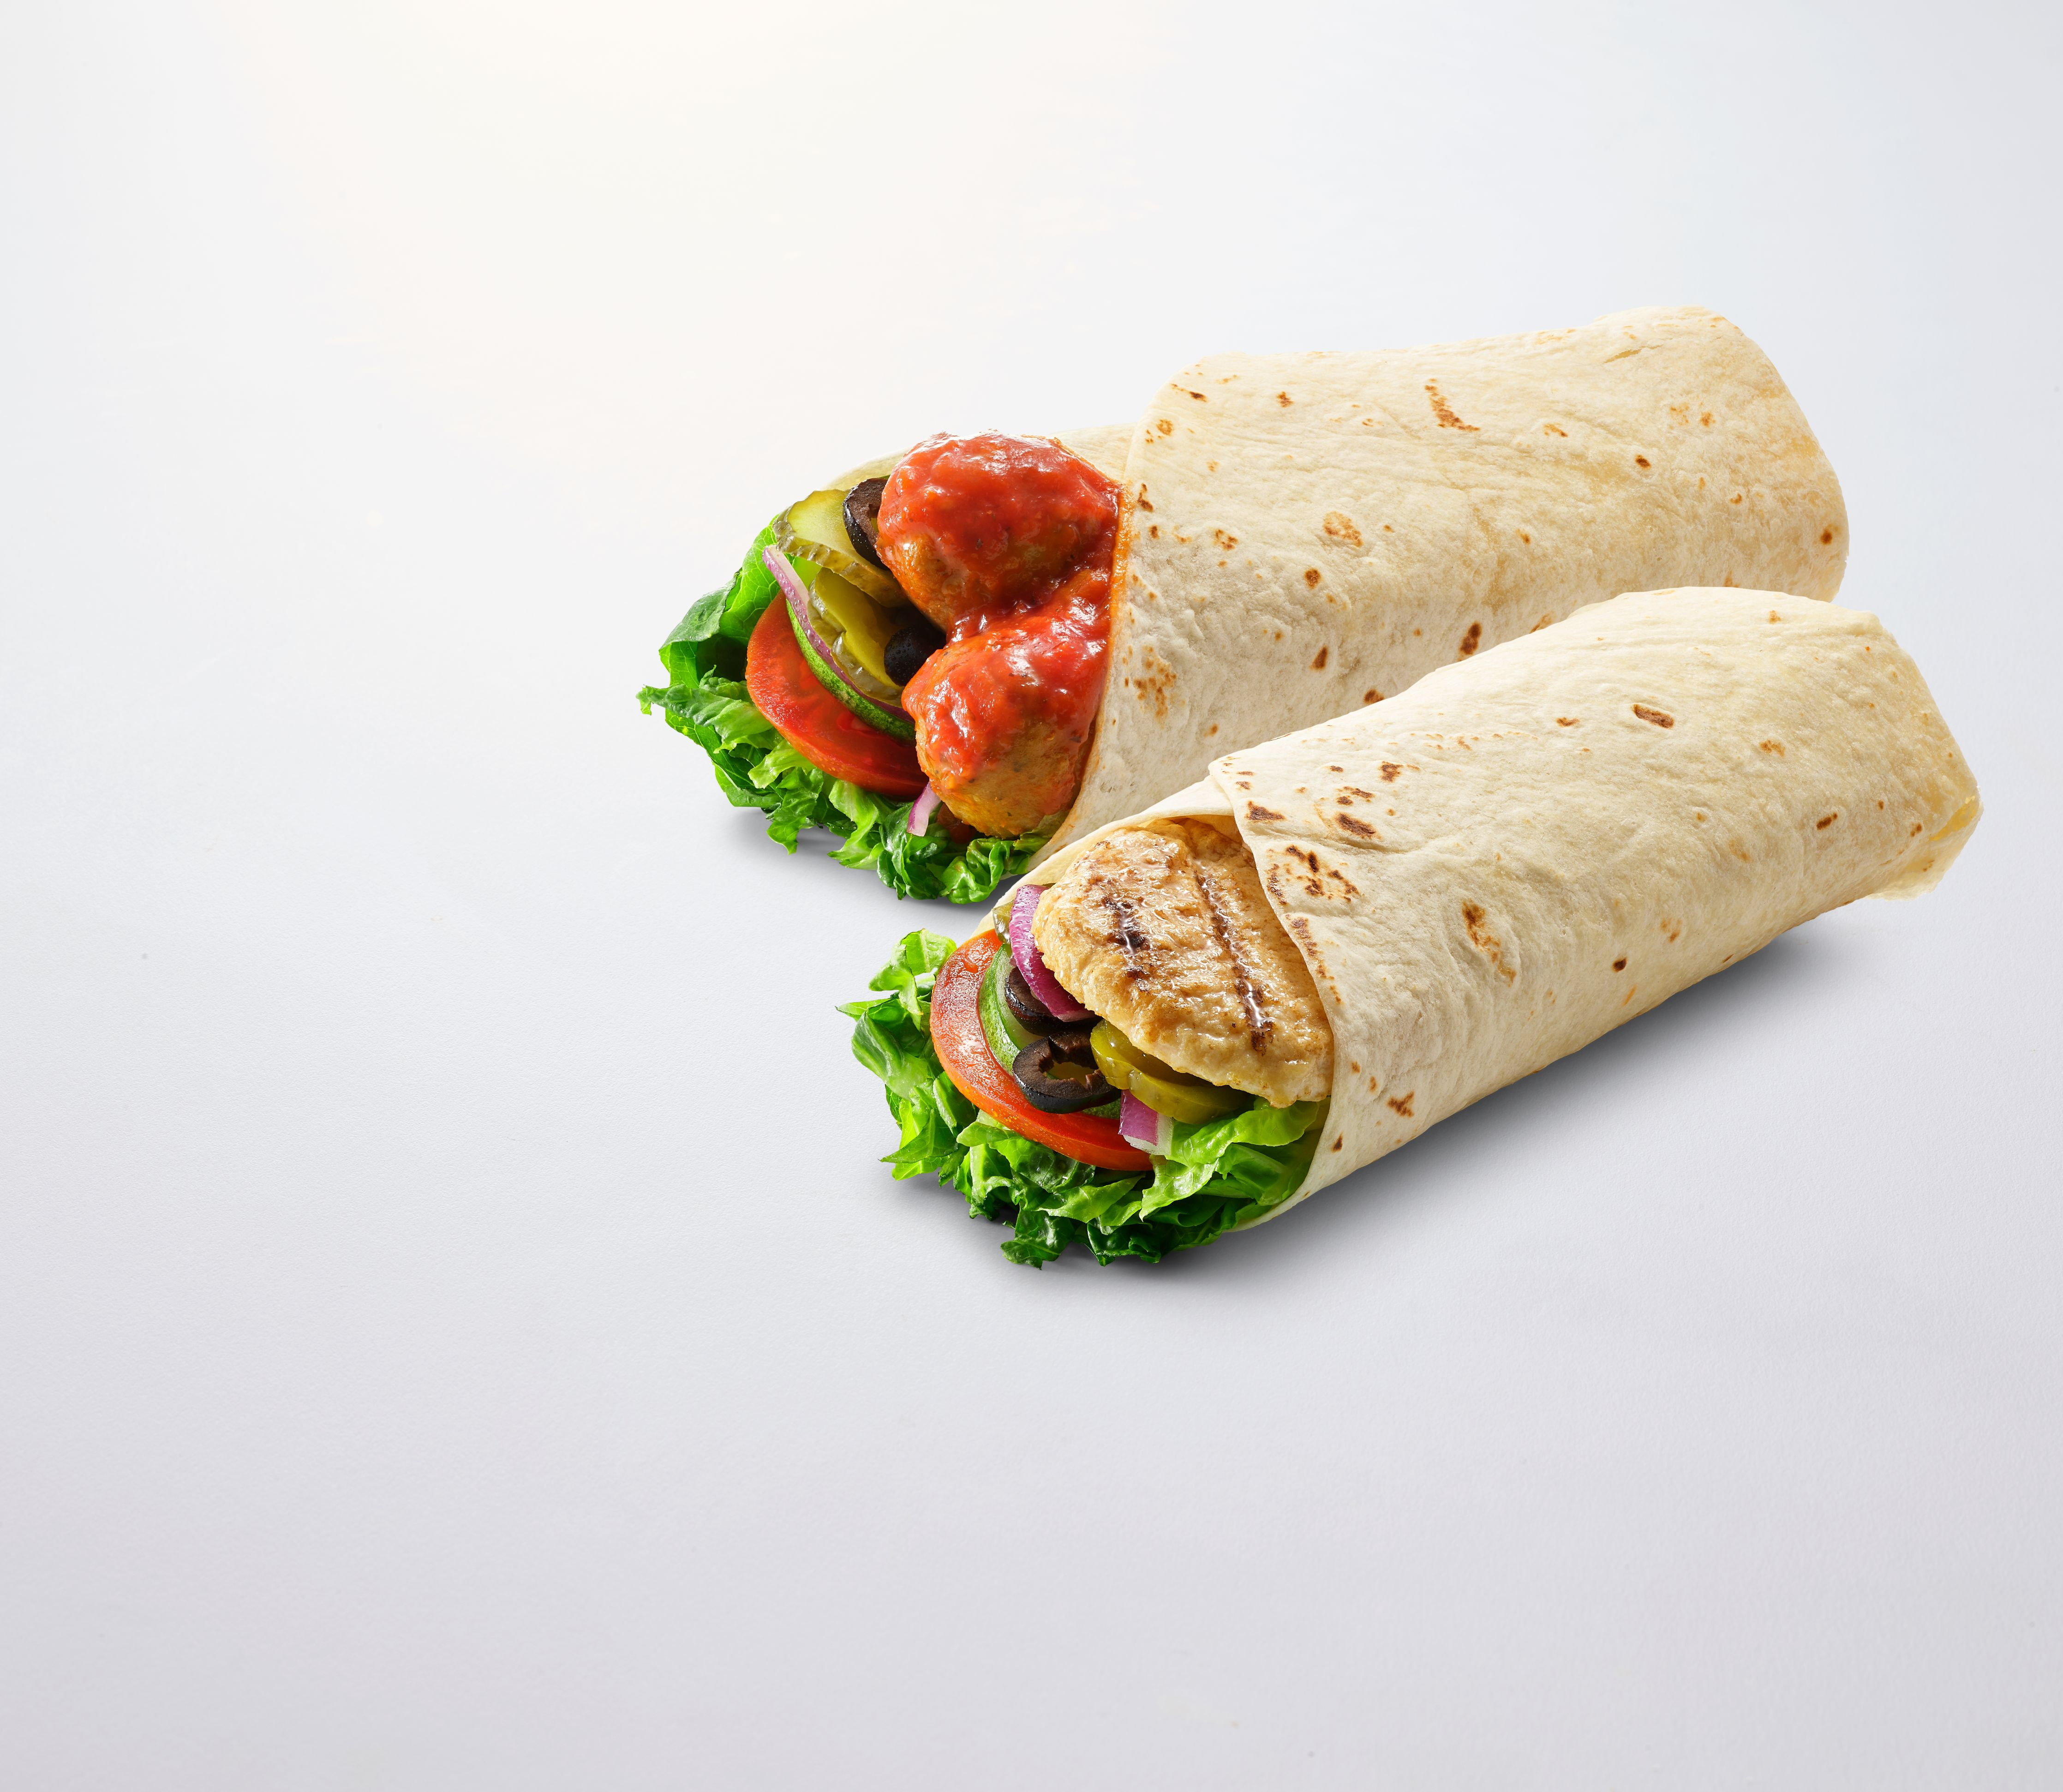 Subway (The Star Vista) - Dine, Shop, Earn